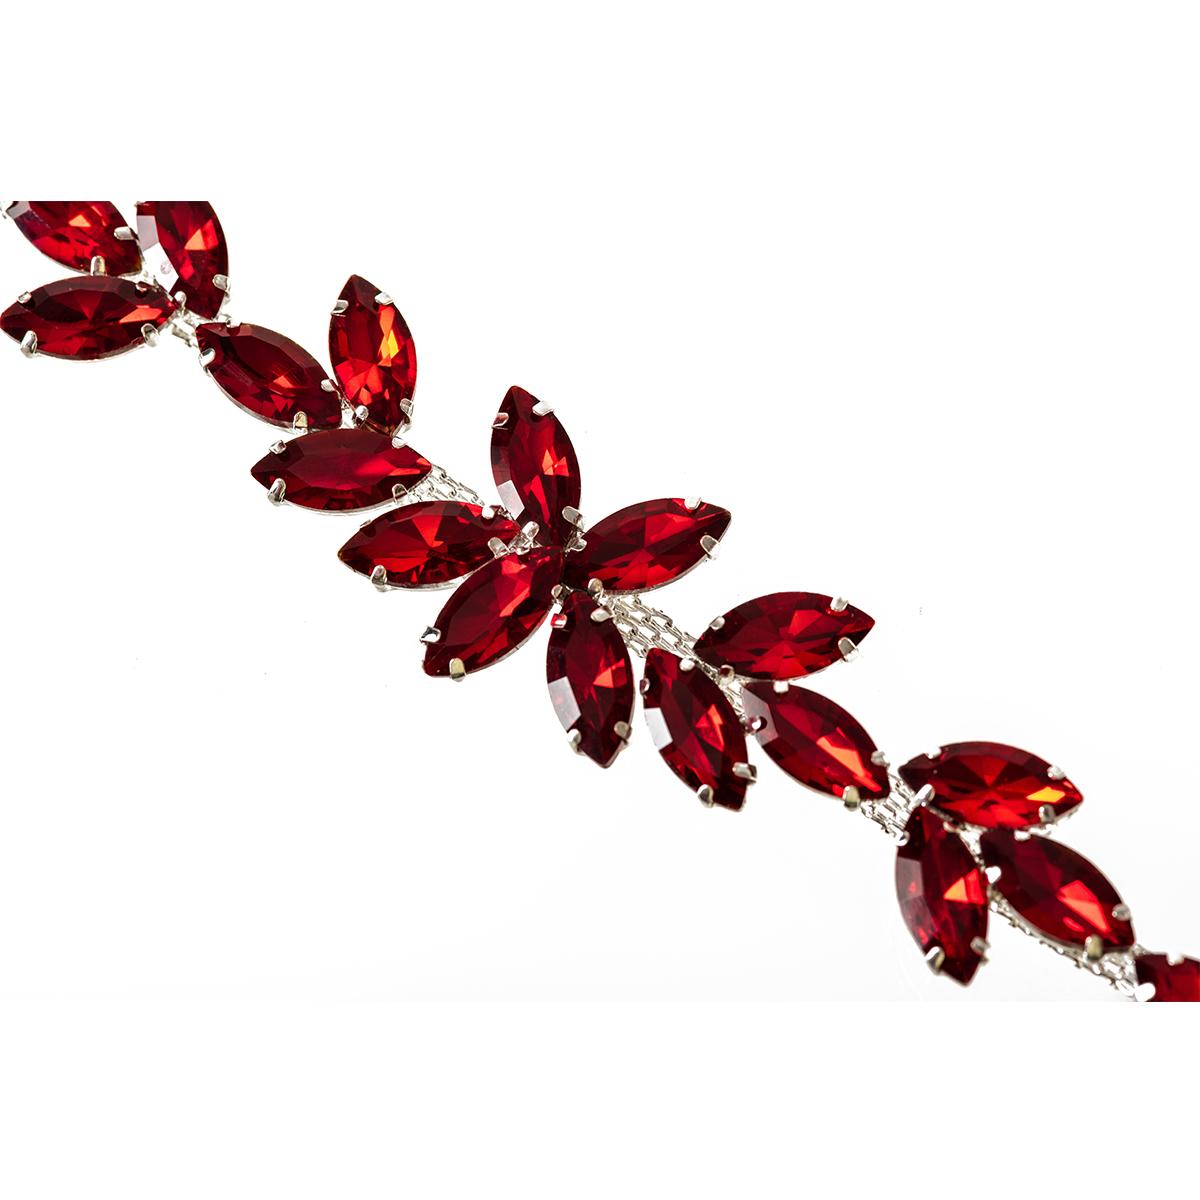 Rhinestone-Diamante-Motif-Applique-Sew-on-Crystal-Patch-for-Wedding-Bridal-Dress thumbnail 31